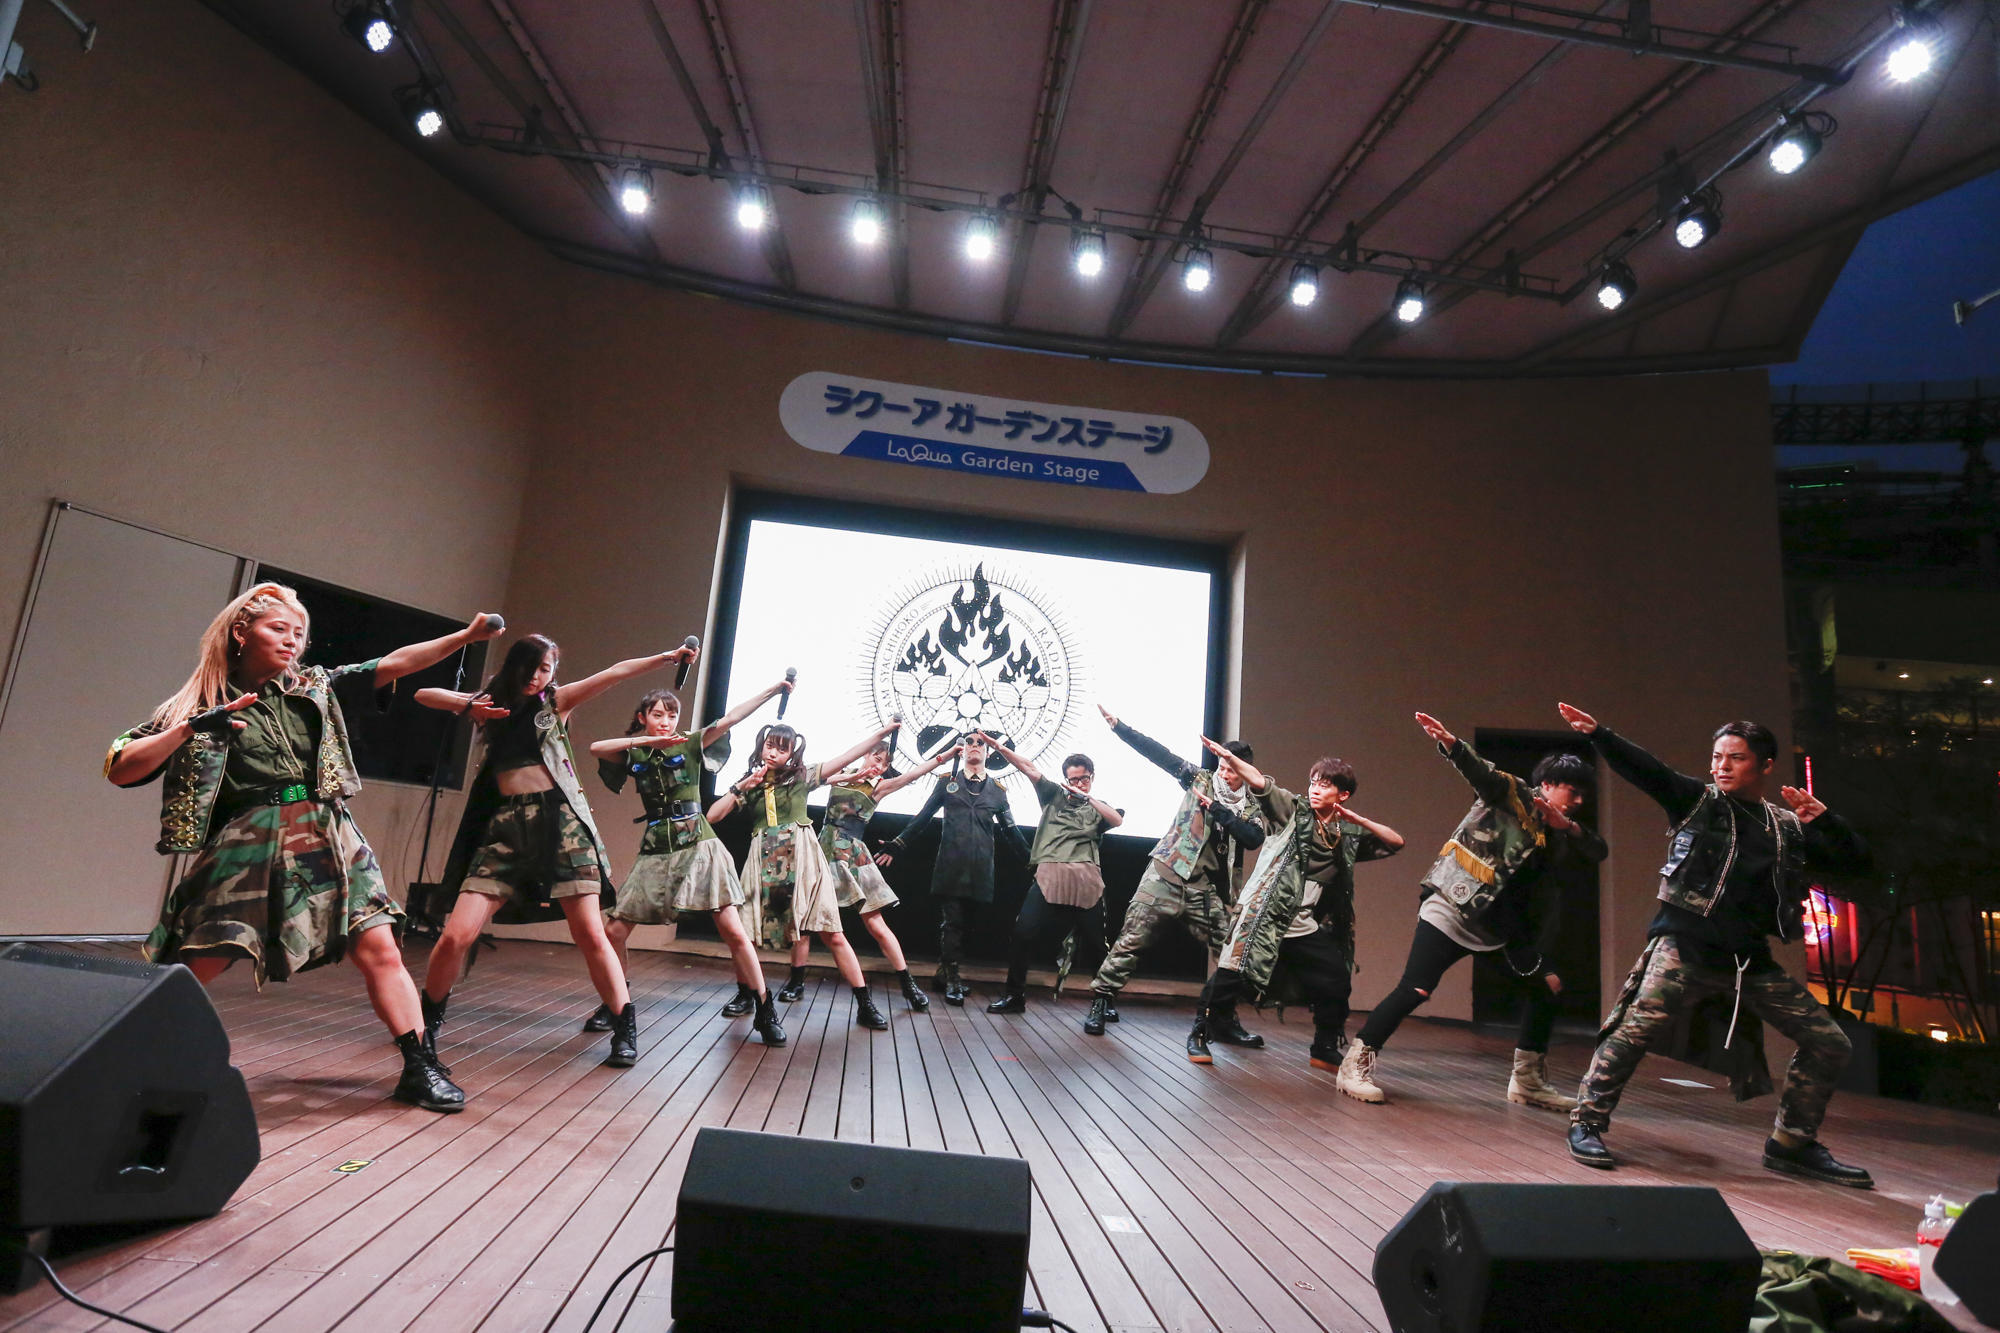 http://news.yoshimoto.co.jp/20180830153933-bca56b2146688ec8383fa42ce599fda98df0d033.jpg